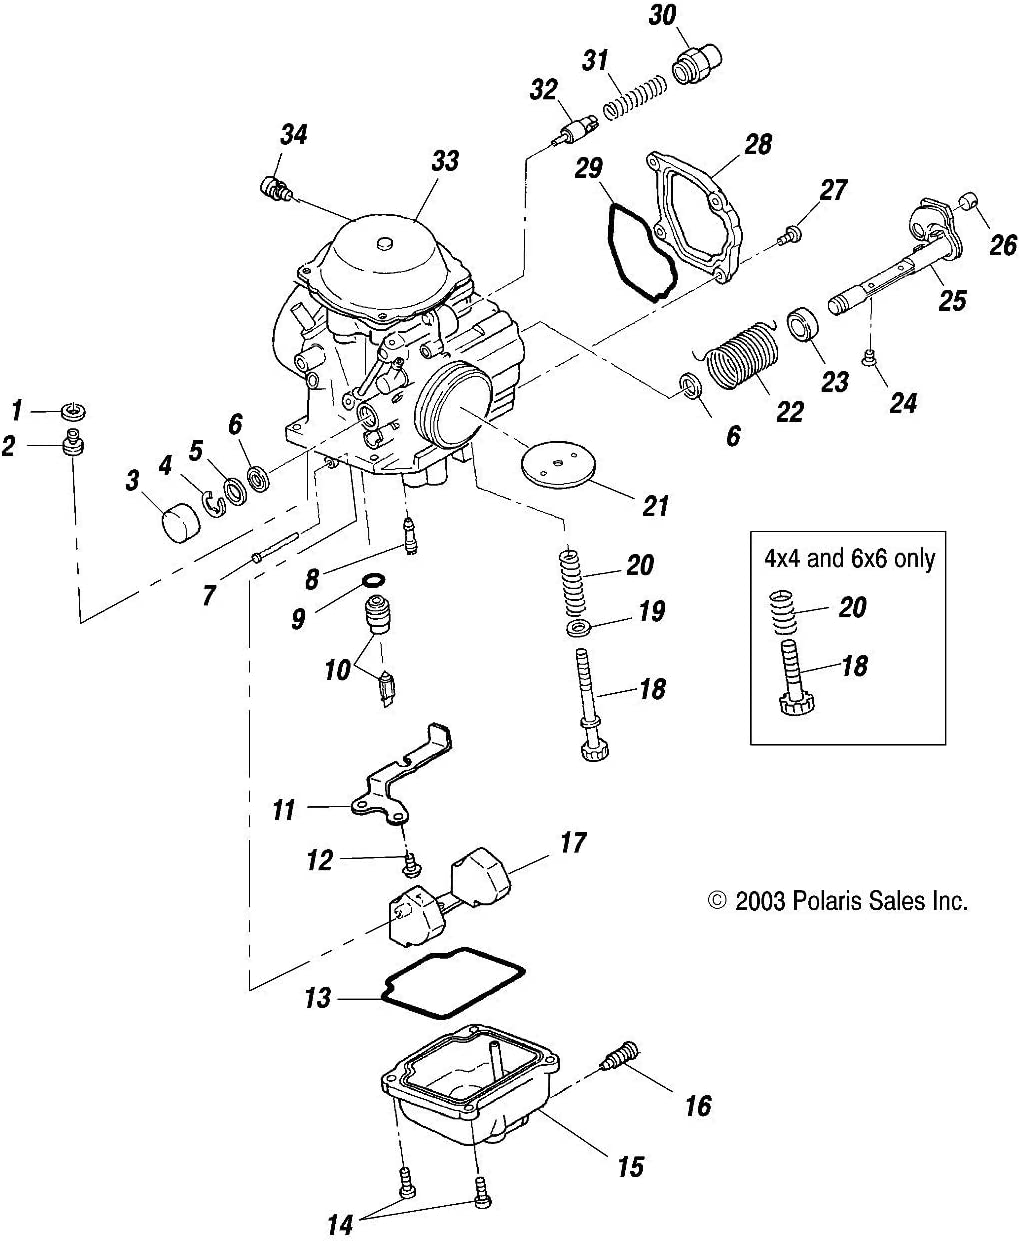 3131360 Polaris ATP Hawkeye Magnum 325 330 400 500 Carburetor Needle and Seat